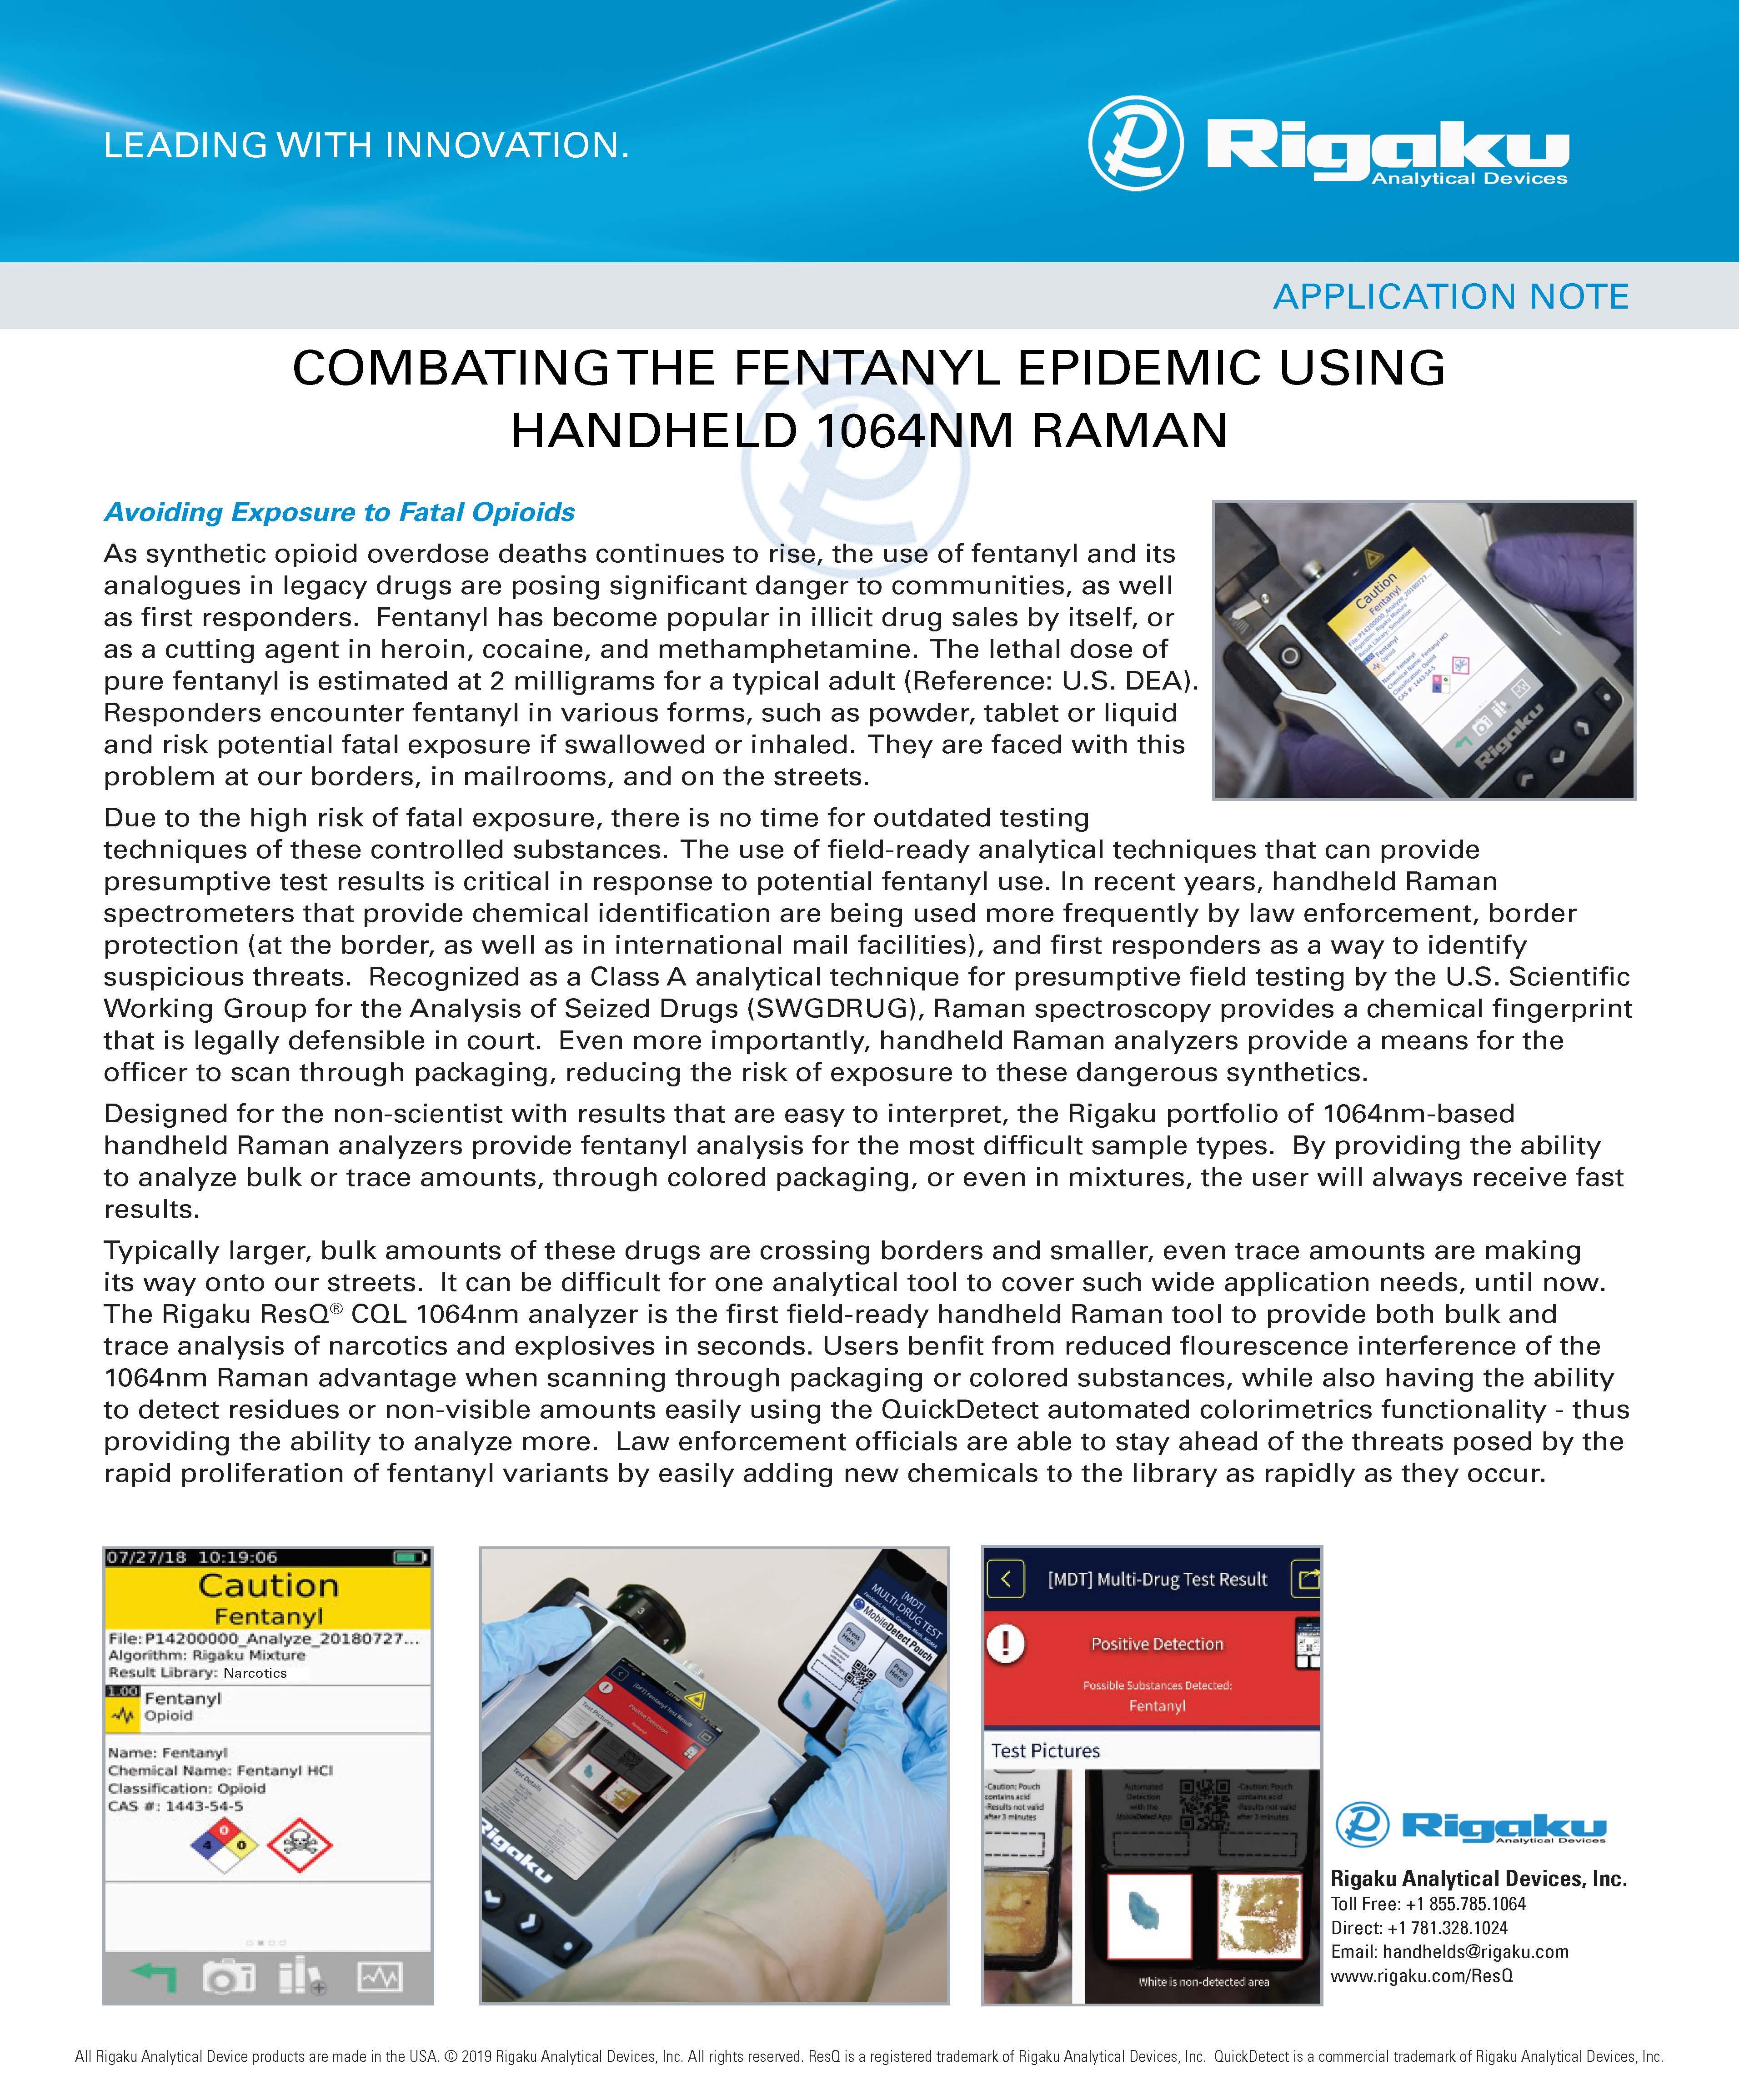 Fentanyl App Note